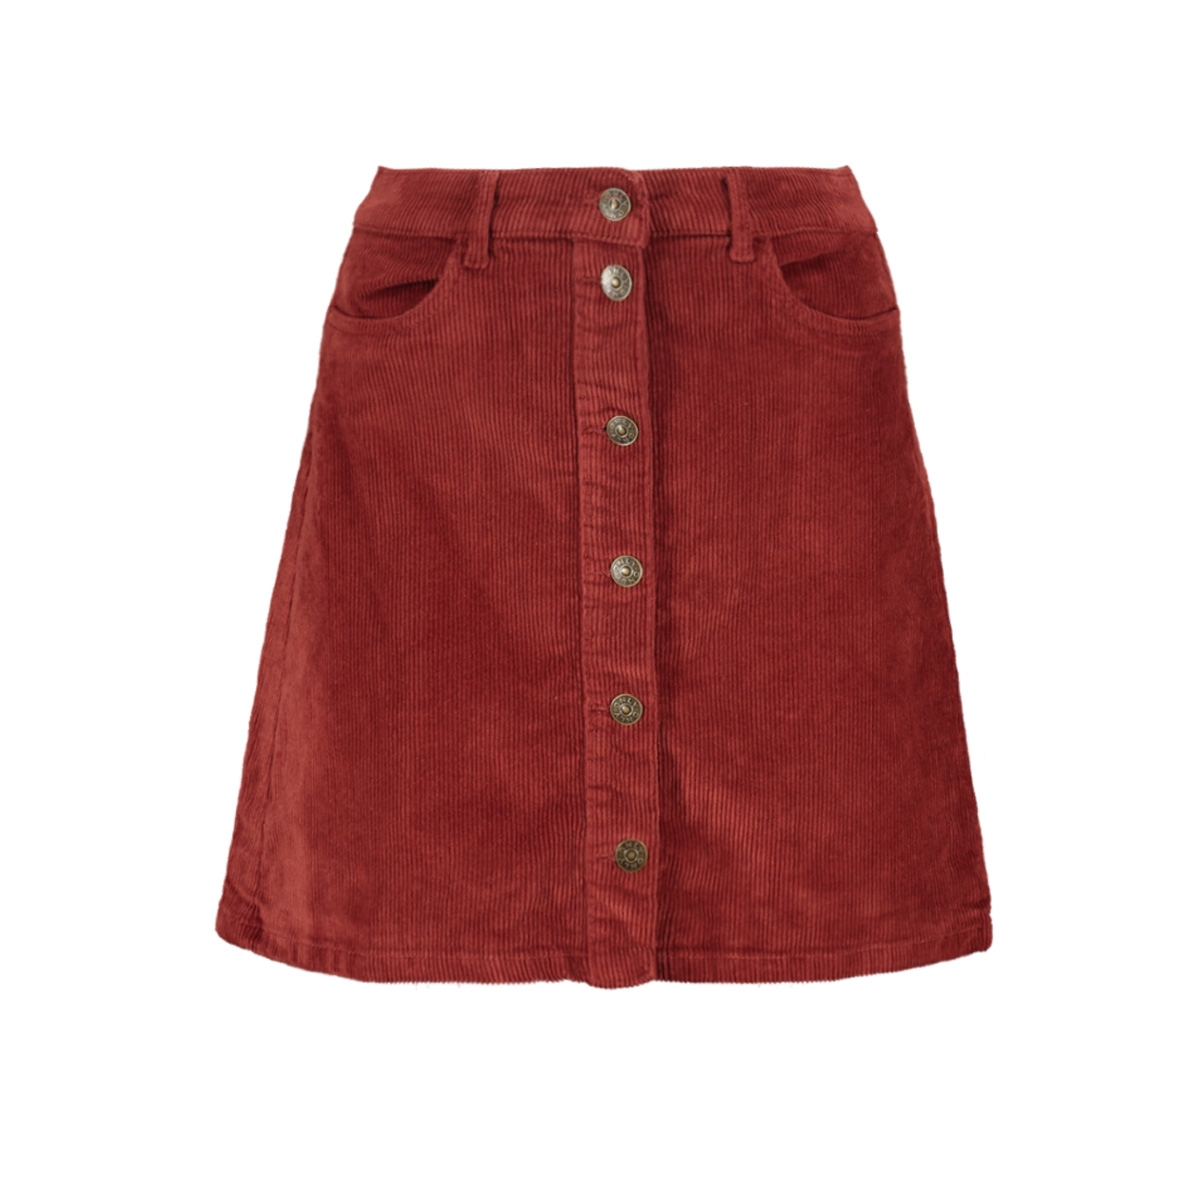 onlglobal cord skirt pnt 15179431 only rok russet brown